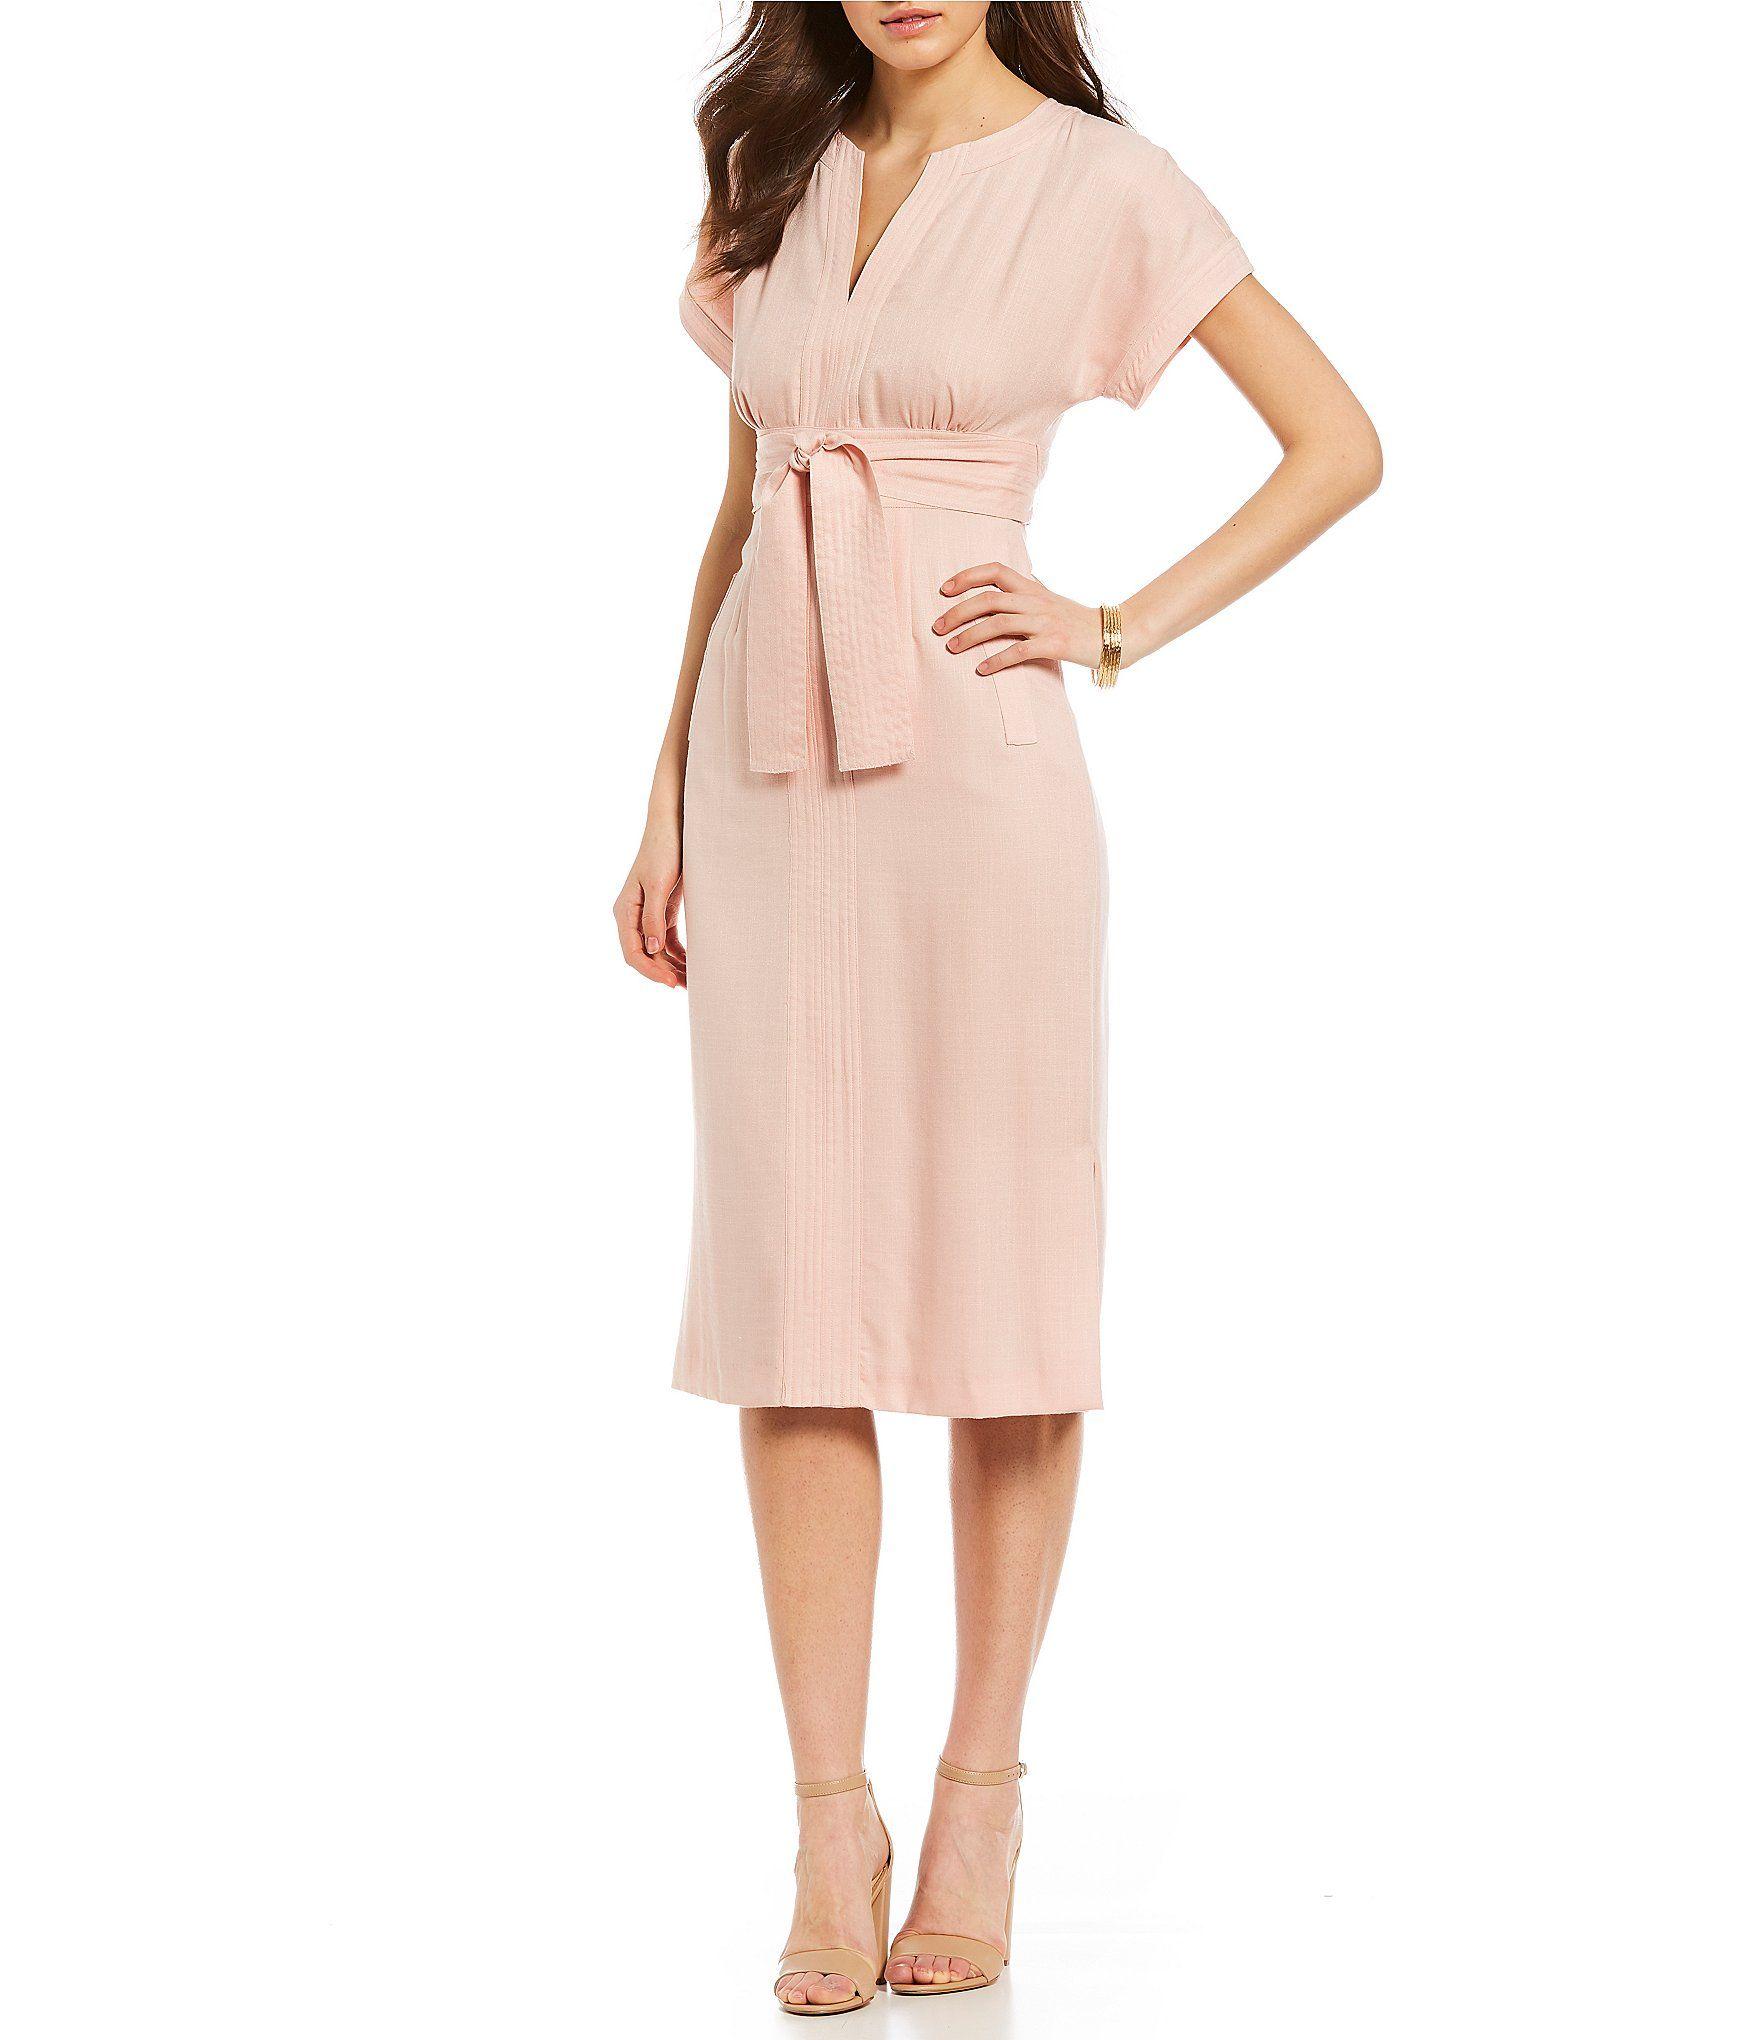 5dea6165438 Shop for Cremieux Rosalie Bow Tie Front Midi Dress at Dillards.com. Visit  Dillards.com to find clothing